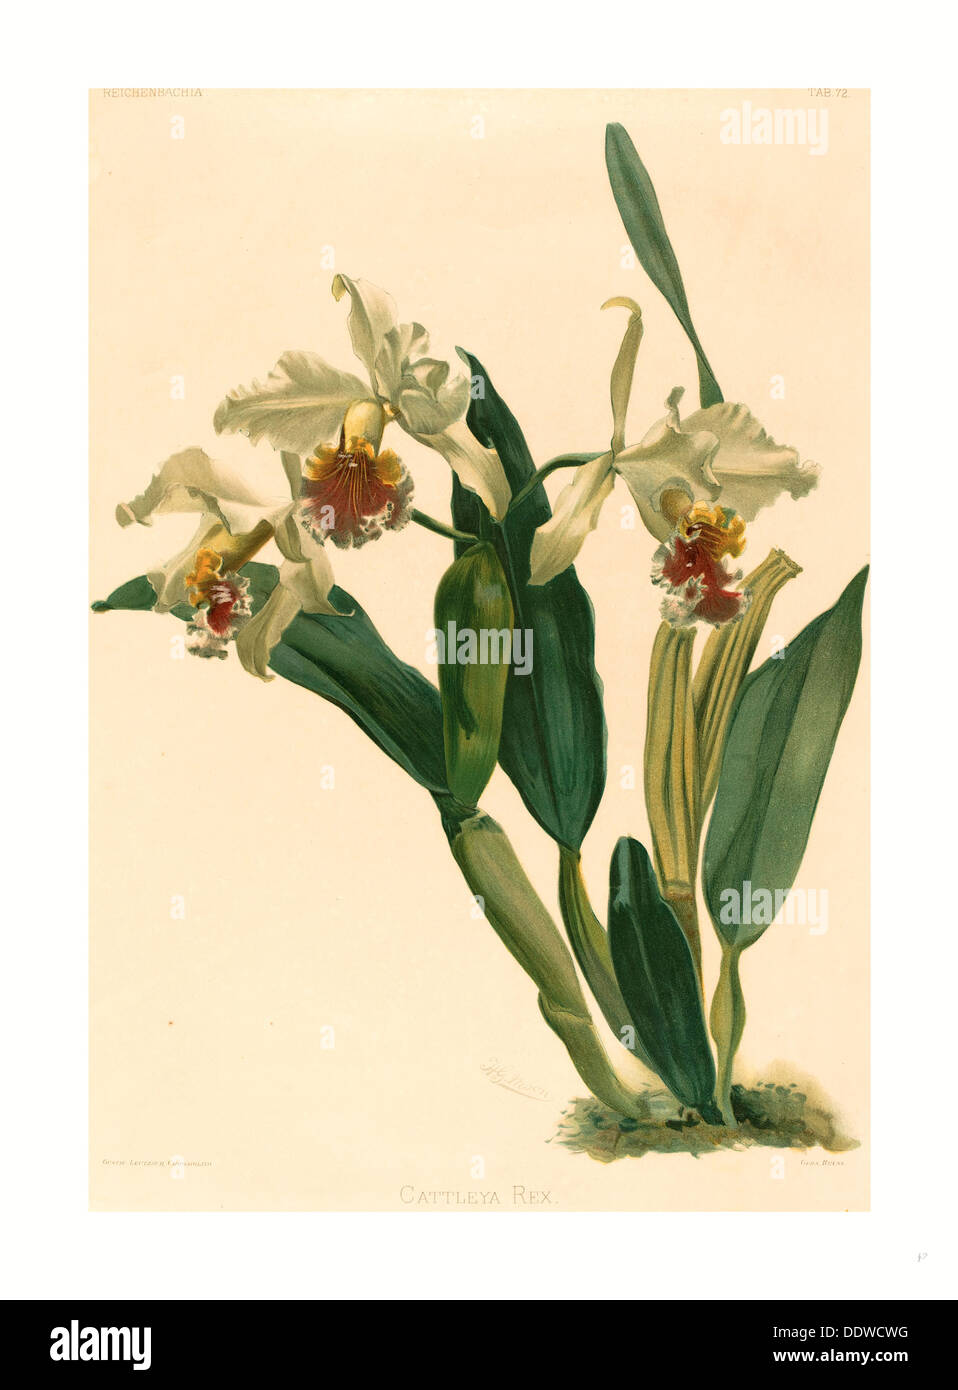 Gustav Leutzsch après Henry George lune (allemand (?), 19e siècle, active ) Cattleya Rex, lithographie Photo Stock